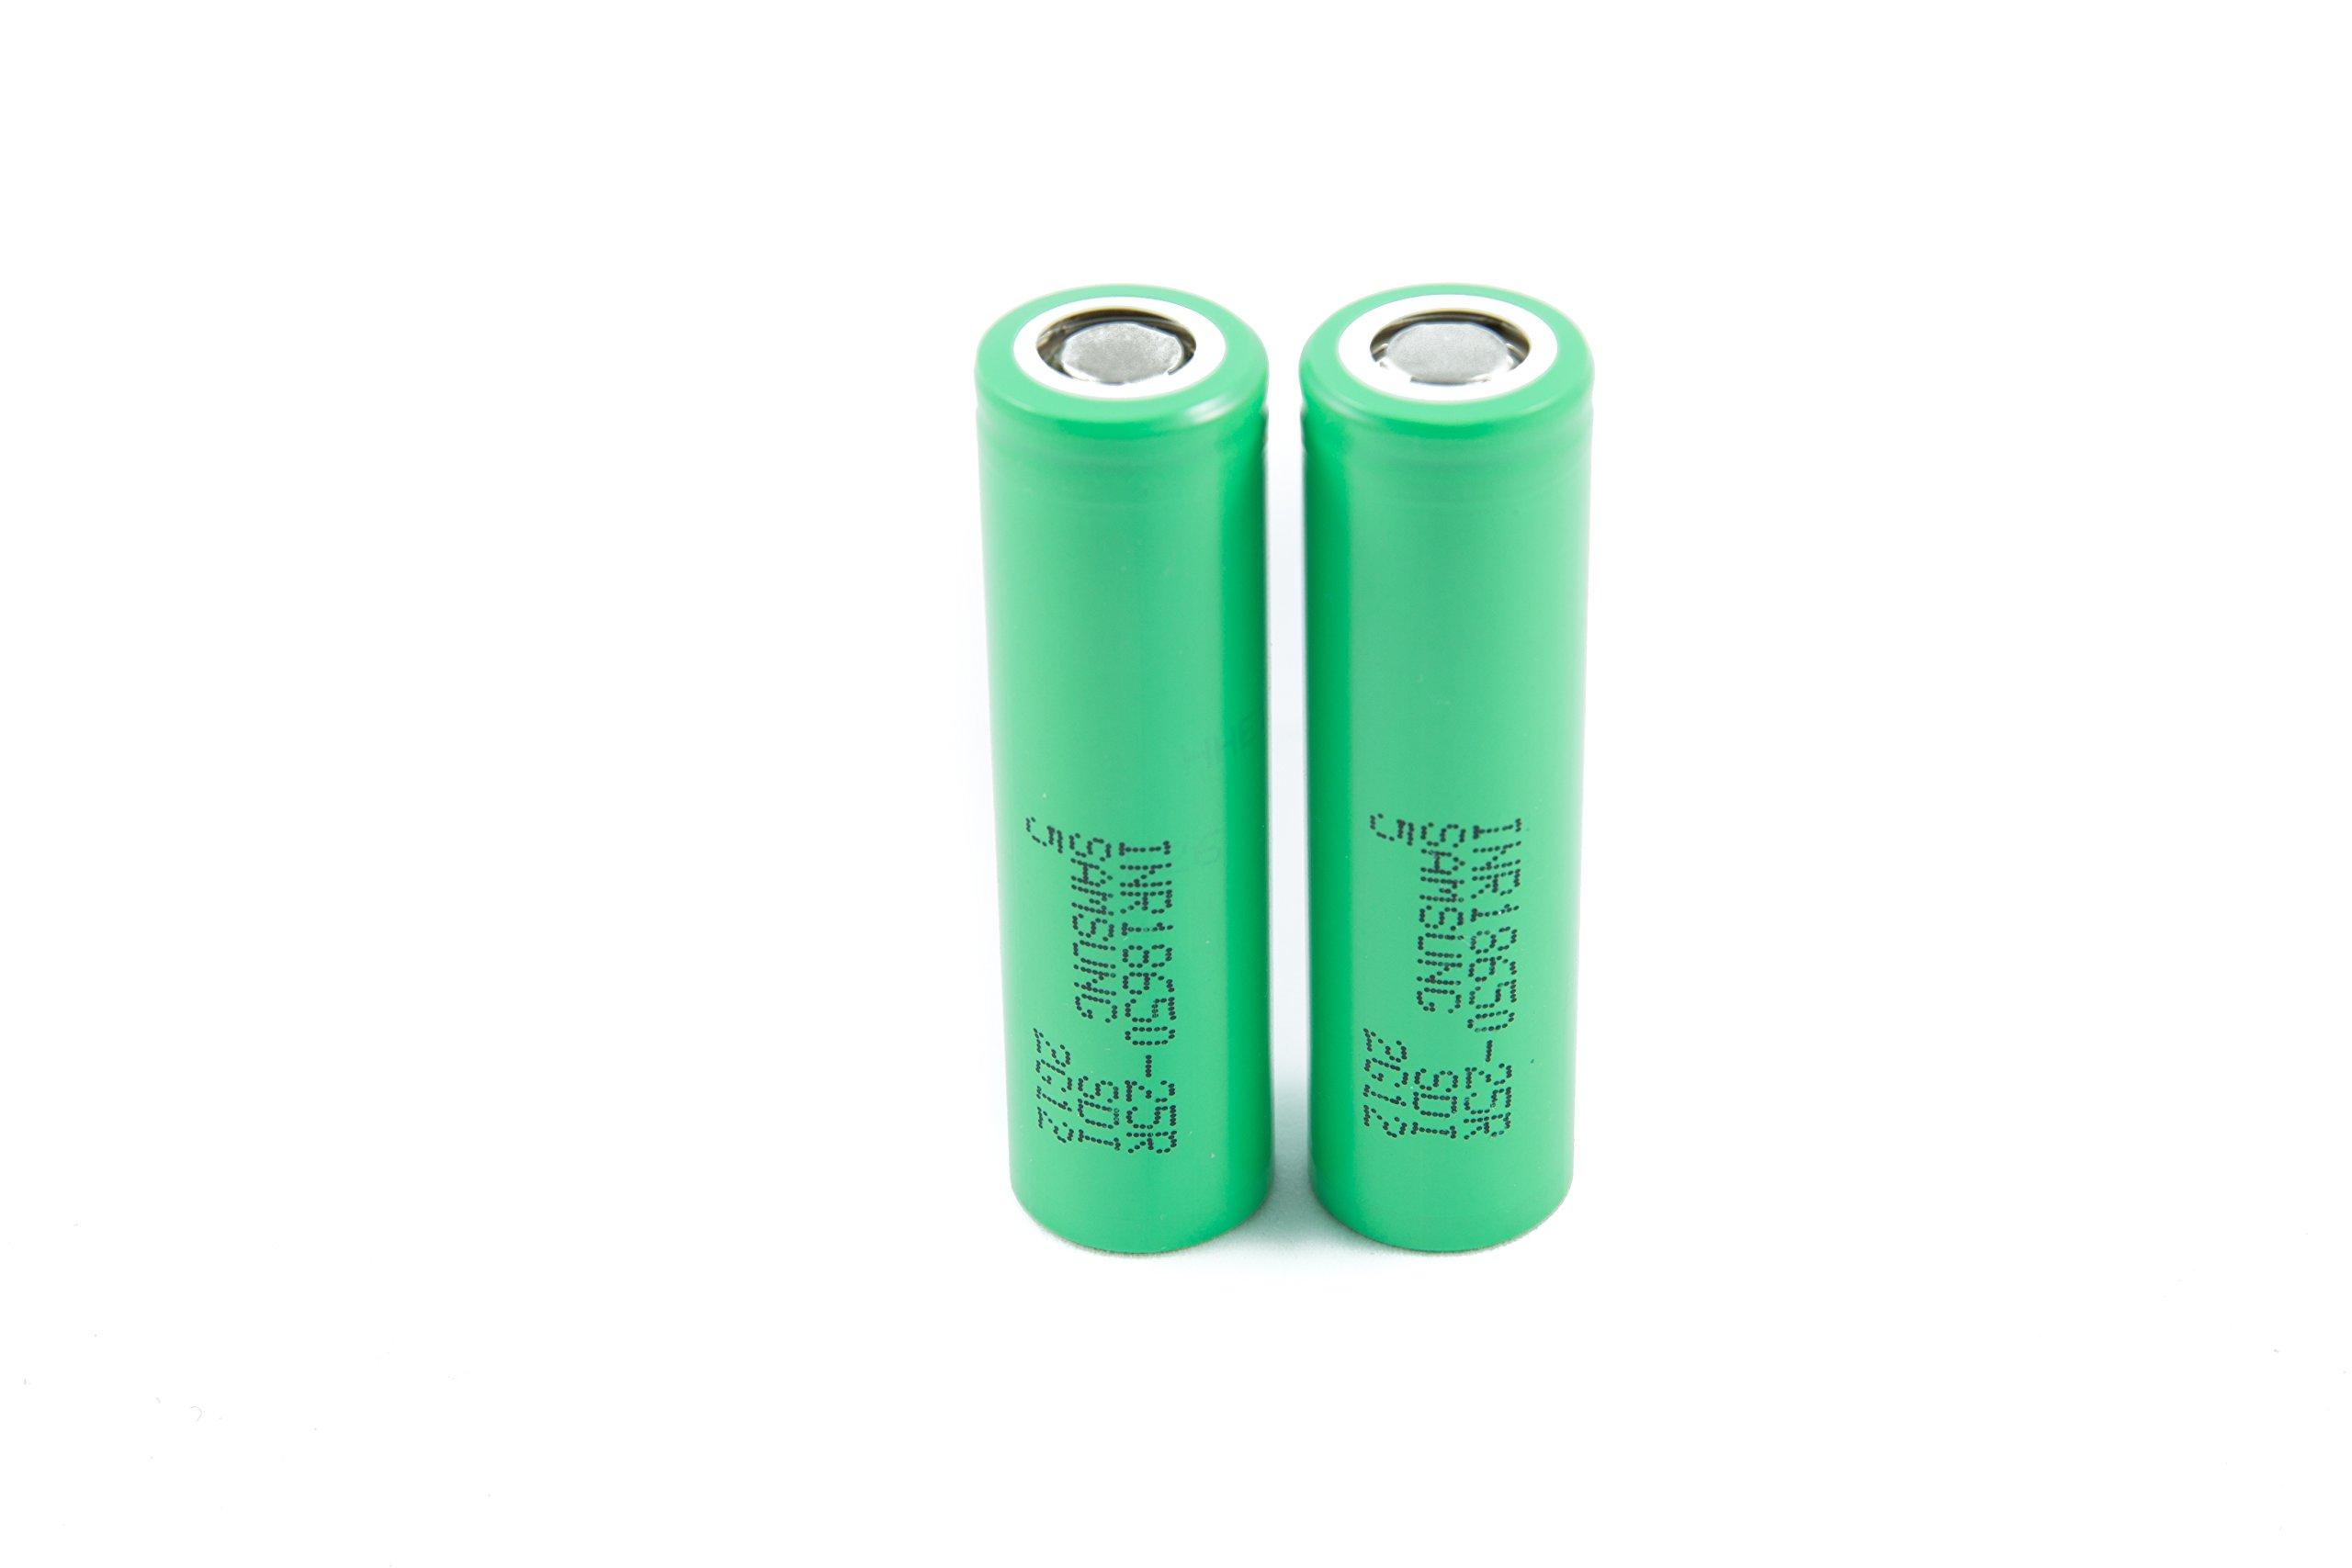 2pcs Samsung INR18650-25R 18650 2500mAh 3.7v Li-ion 20A discharge Authentic Grade-A Guarantee by CTINAW HOBBY (Image #2)